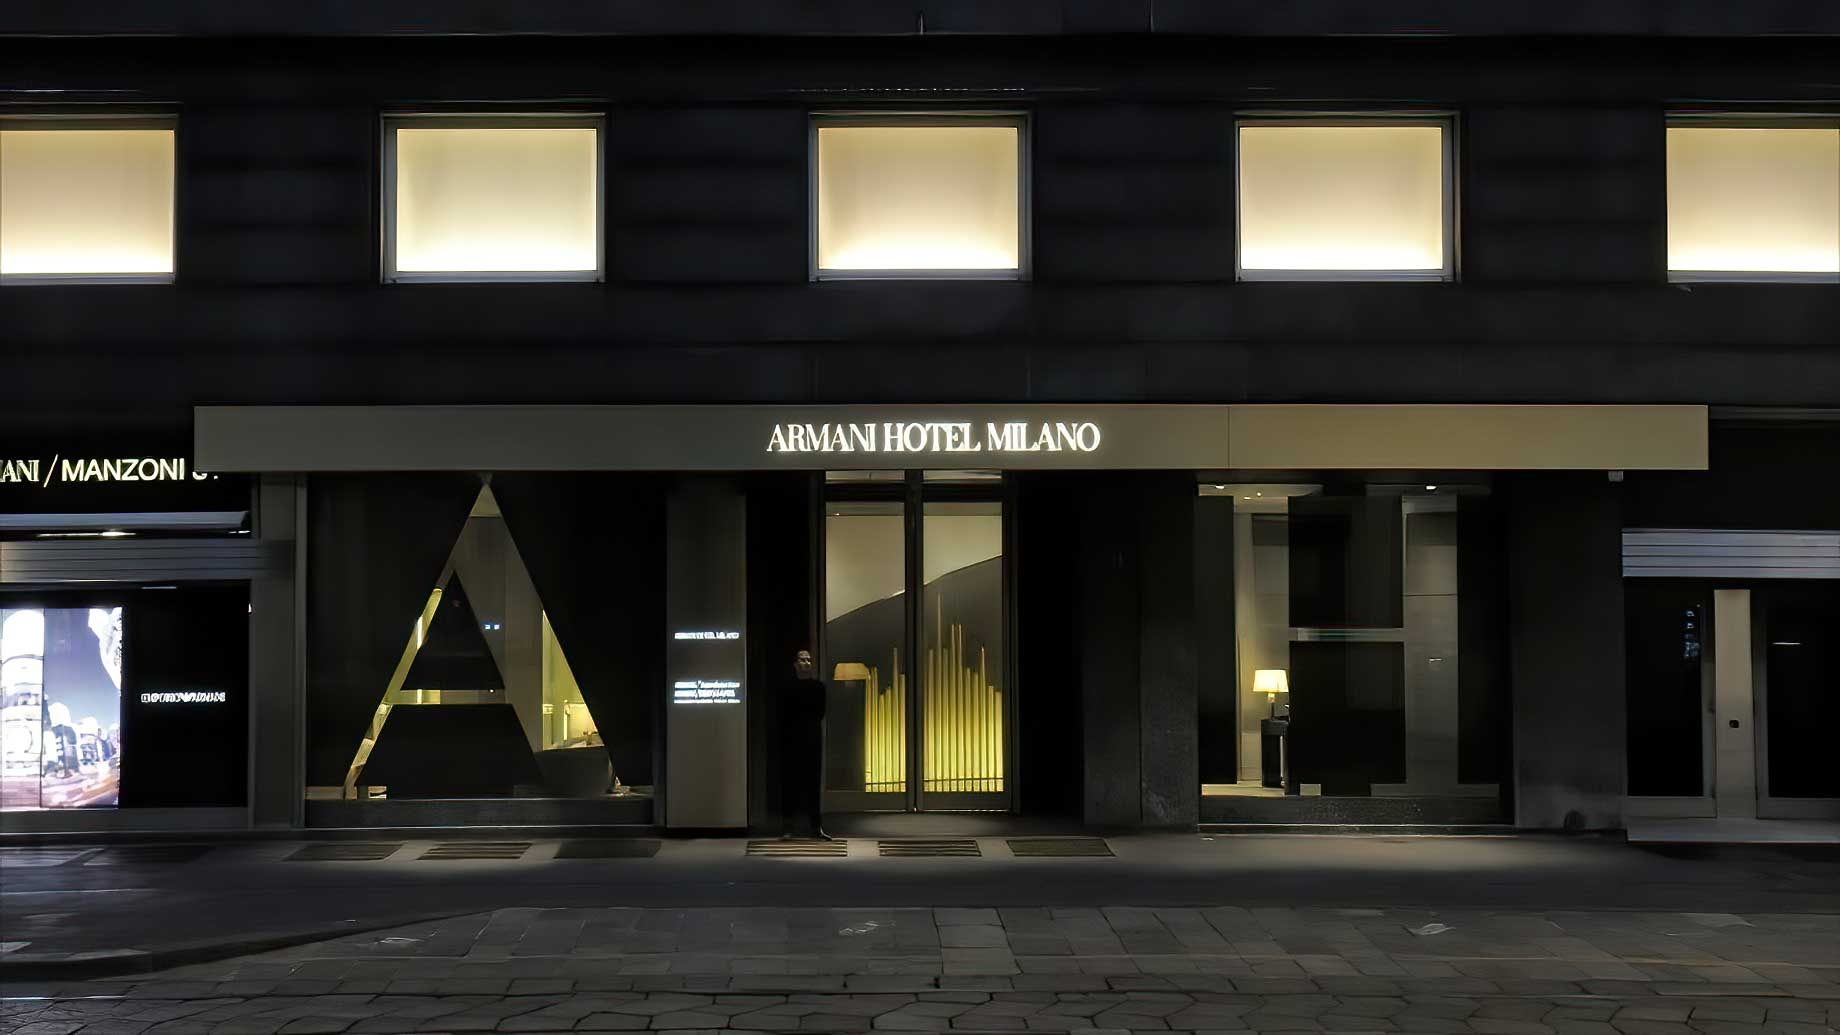 Armani Luxury Hotel Milano - Milan, Italy